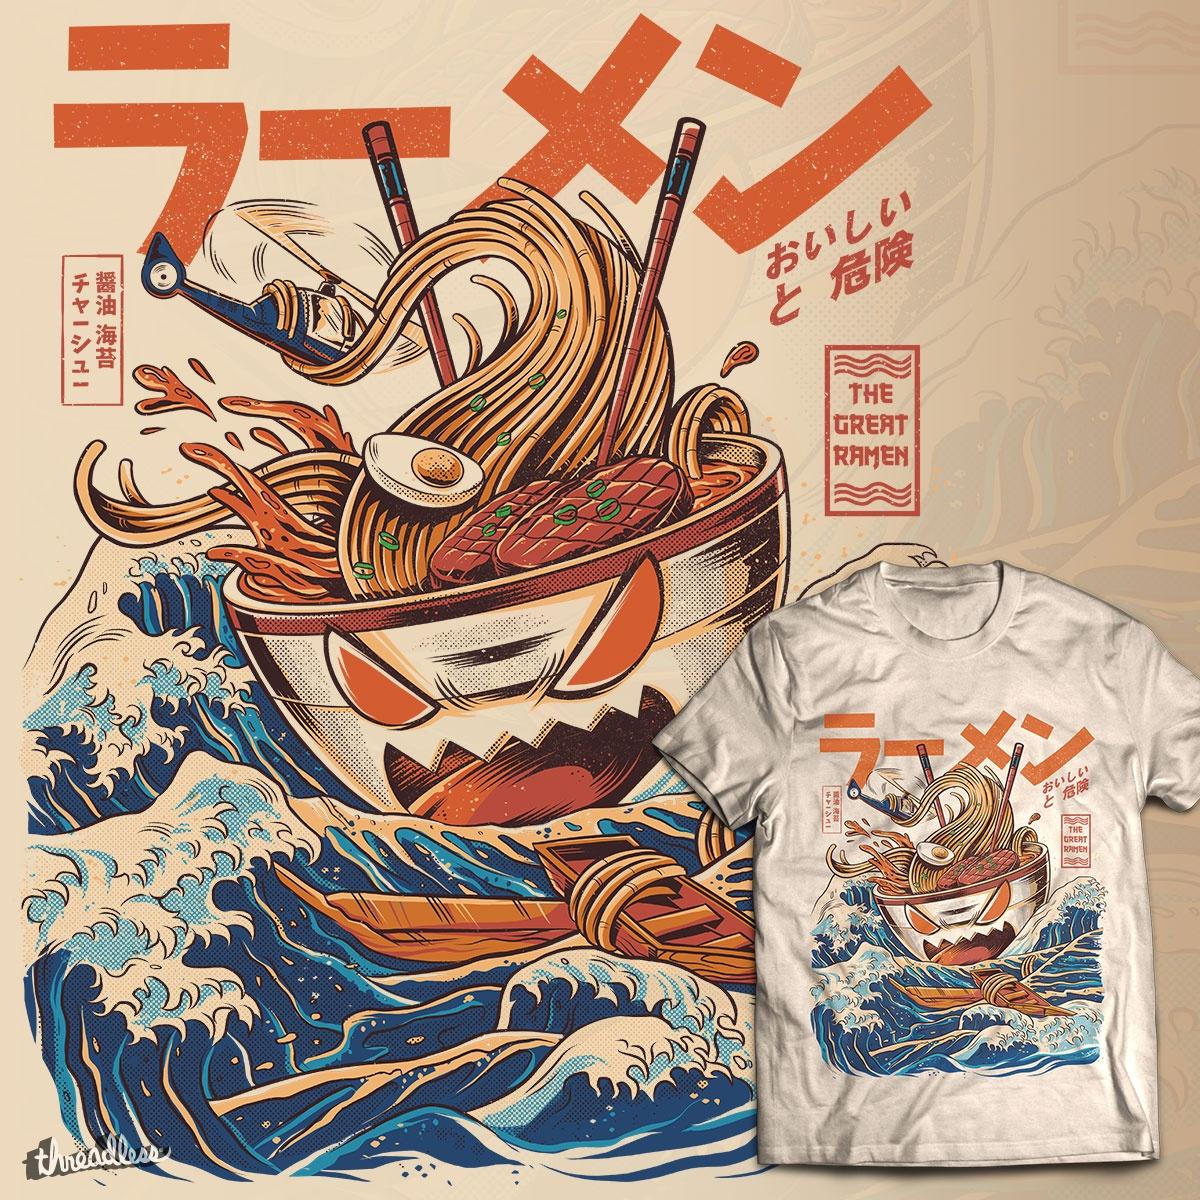 0e242985d The Great Ramen off Kanagawa, a cool t-shirt by Ilustrata on Threadless